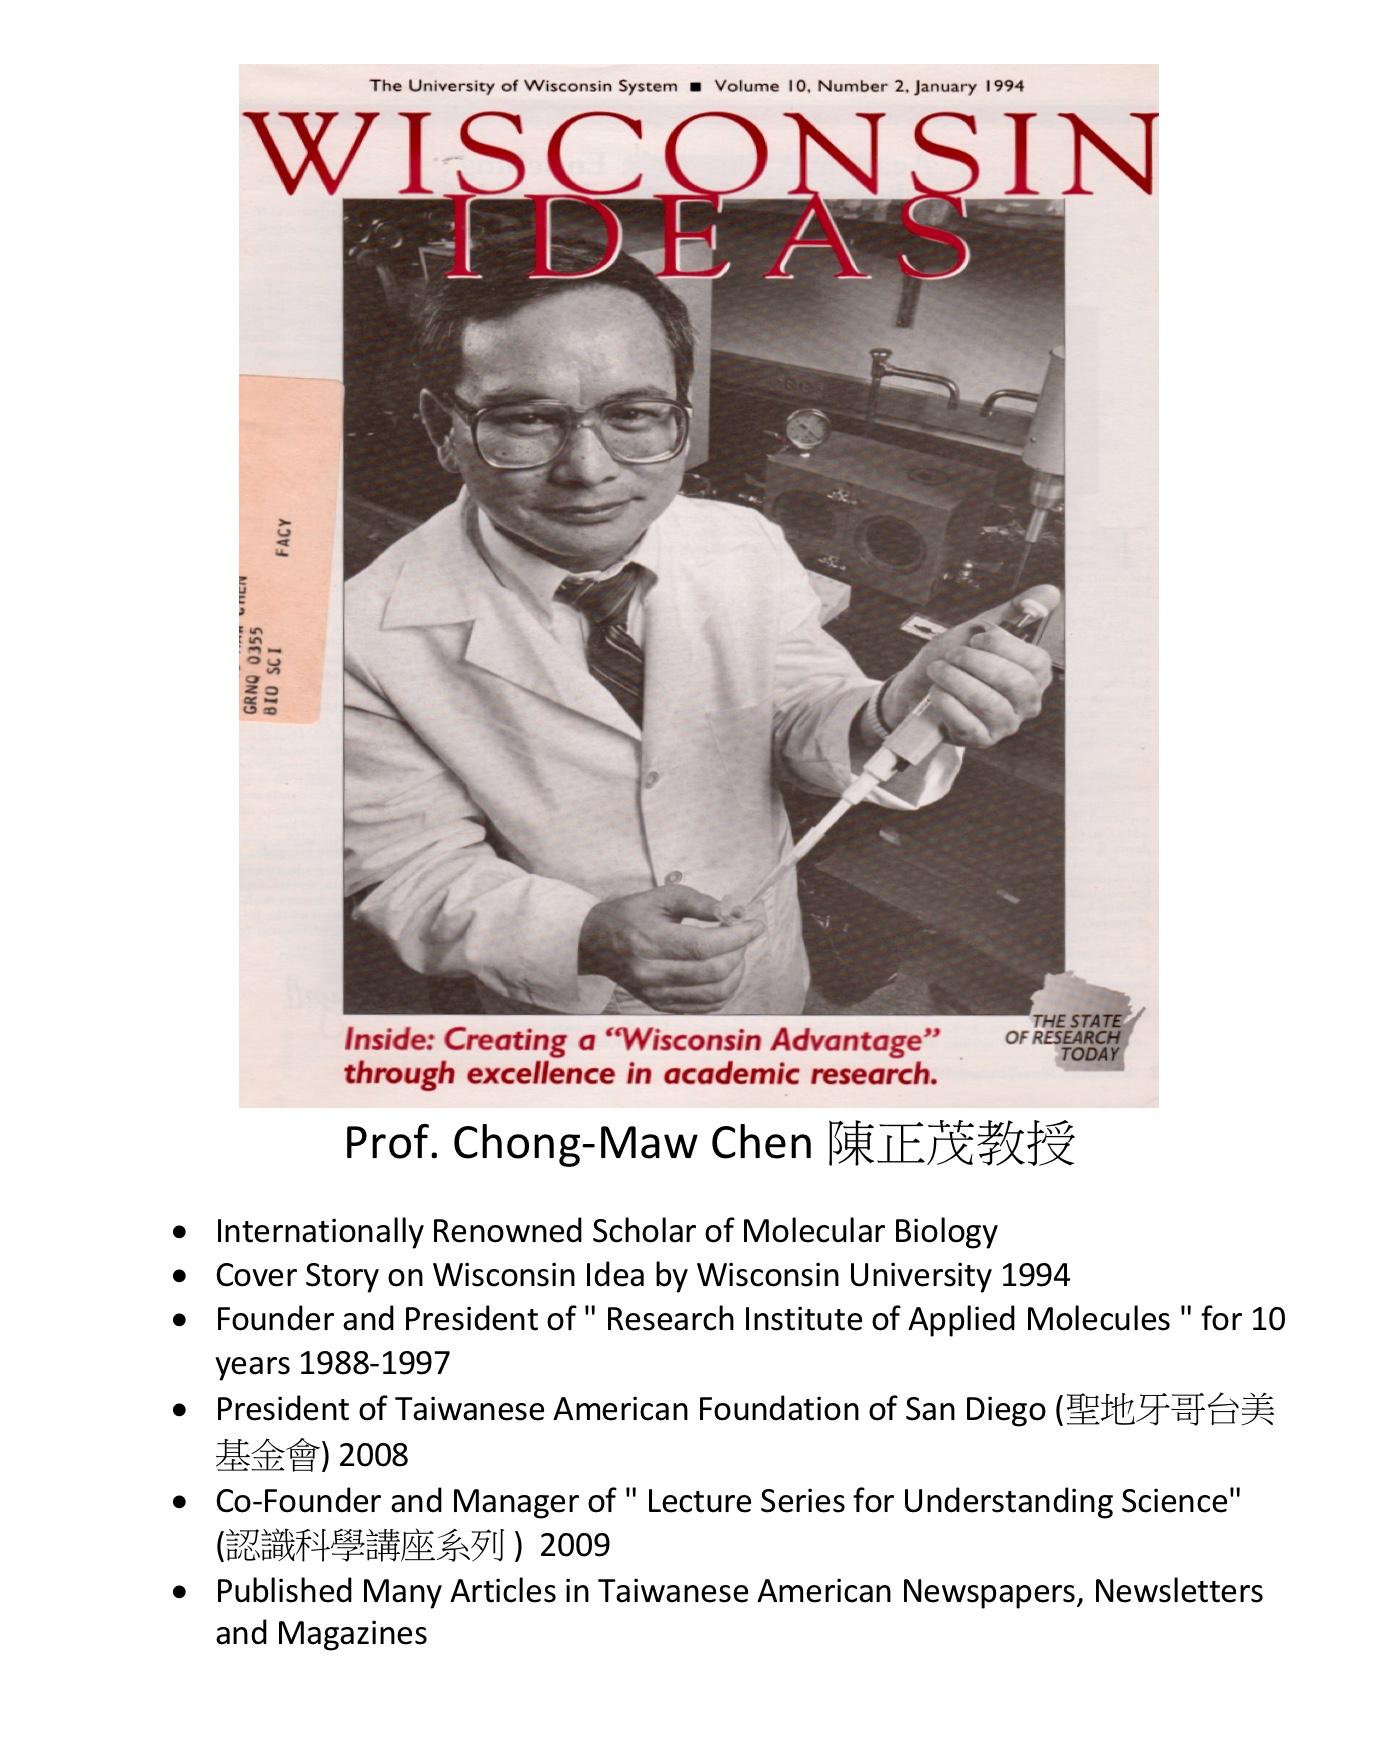 188. Prof. Chong-Maw Chen 陳正茂教授